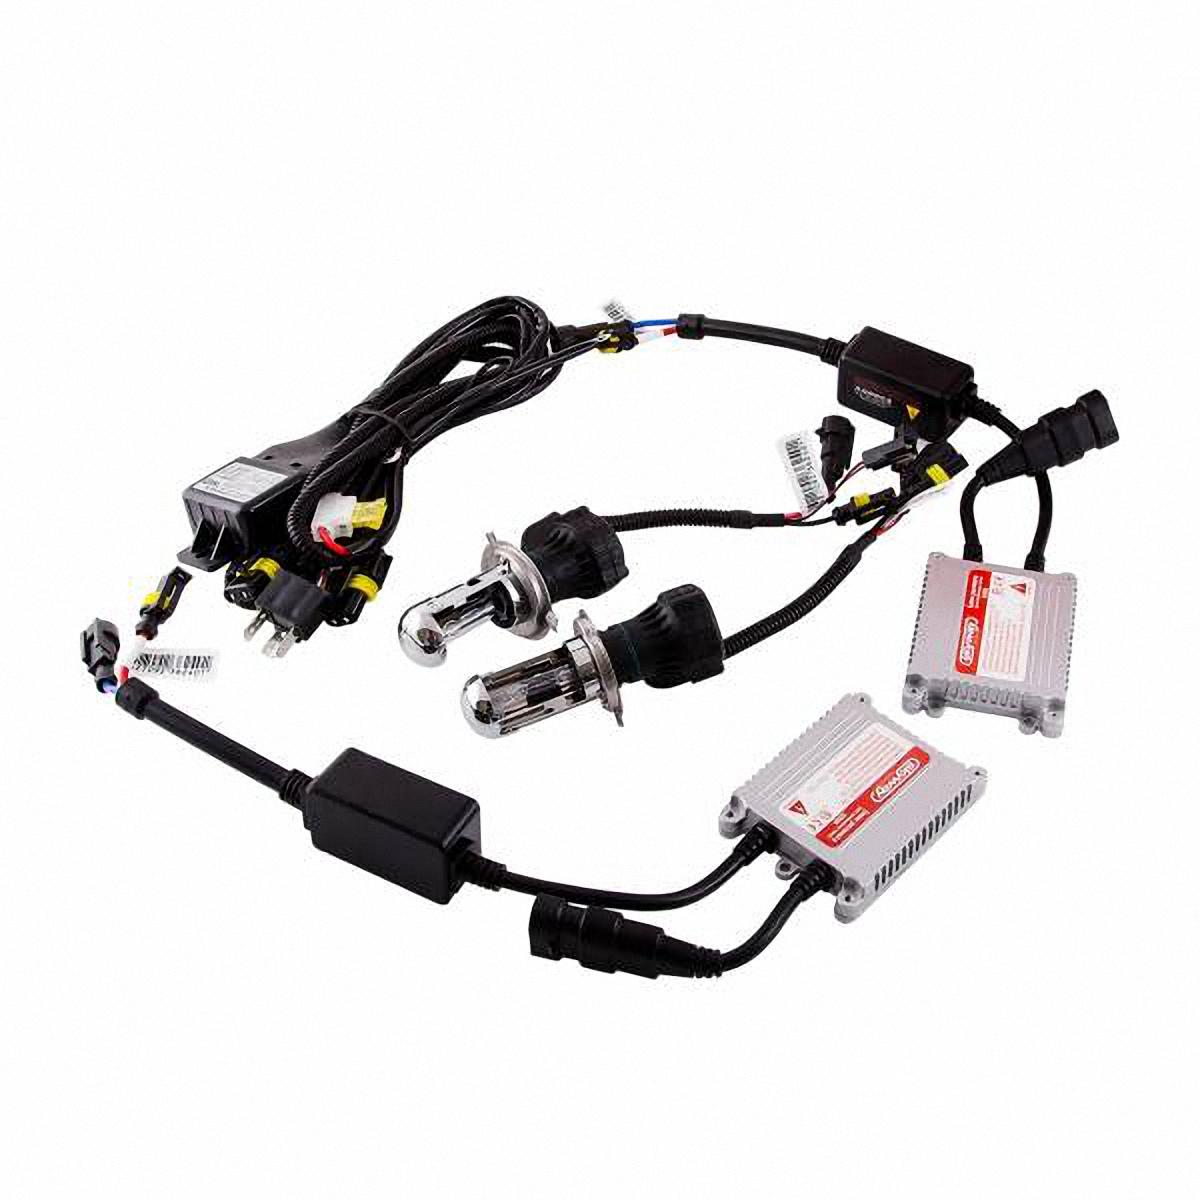 Skyway Автолампа ксенон H7. SH7 6000K D13 12V35WSH7 6000K D13 12V35WКомплектация: Лампа газоразрядная ксеноновая – 2 шт. Блок розжига – 2 шт. Винты для блока розжига – 6 шт. Гарантийный талон – 1 шт.